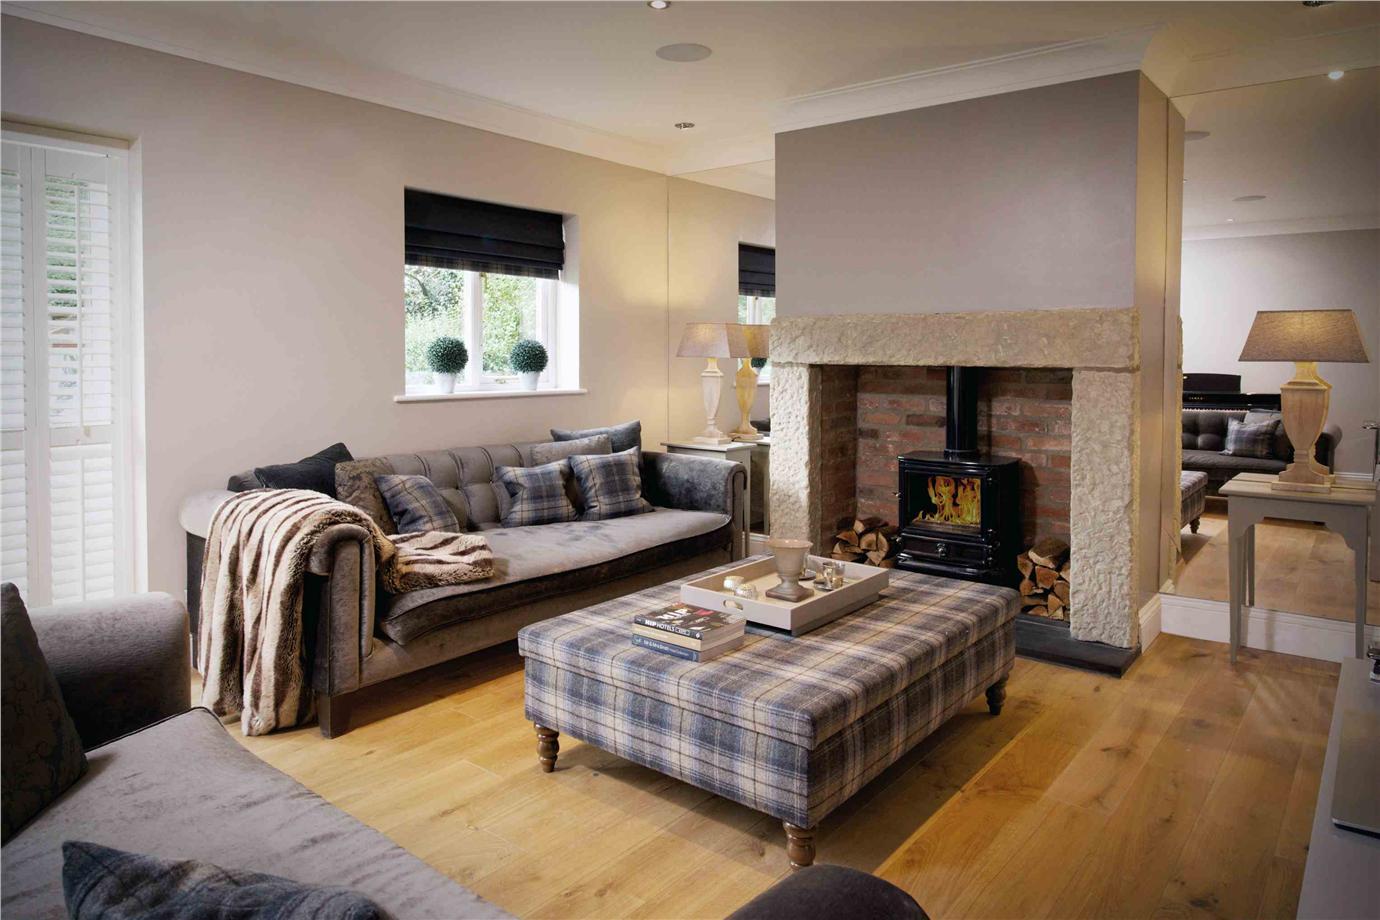 farrow ball charleston gray 243 eparket. Black Bedroom Furniture Sets. Home Design Ideas